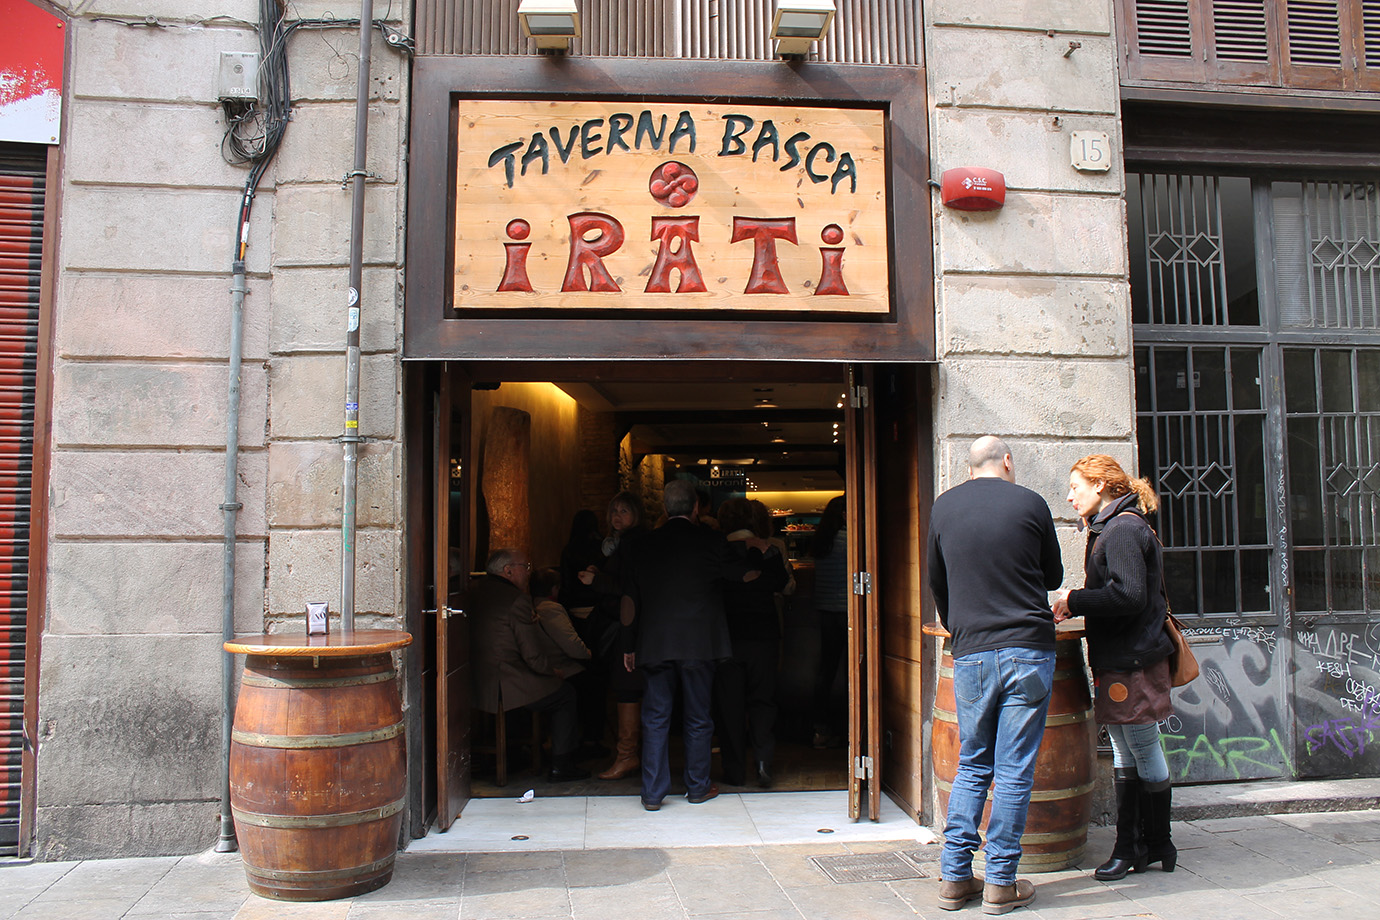 Cake + Whisky | Barcelona travel guide | Irati Taverna Basca